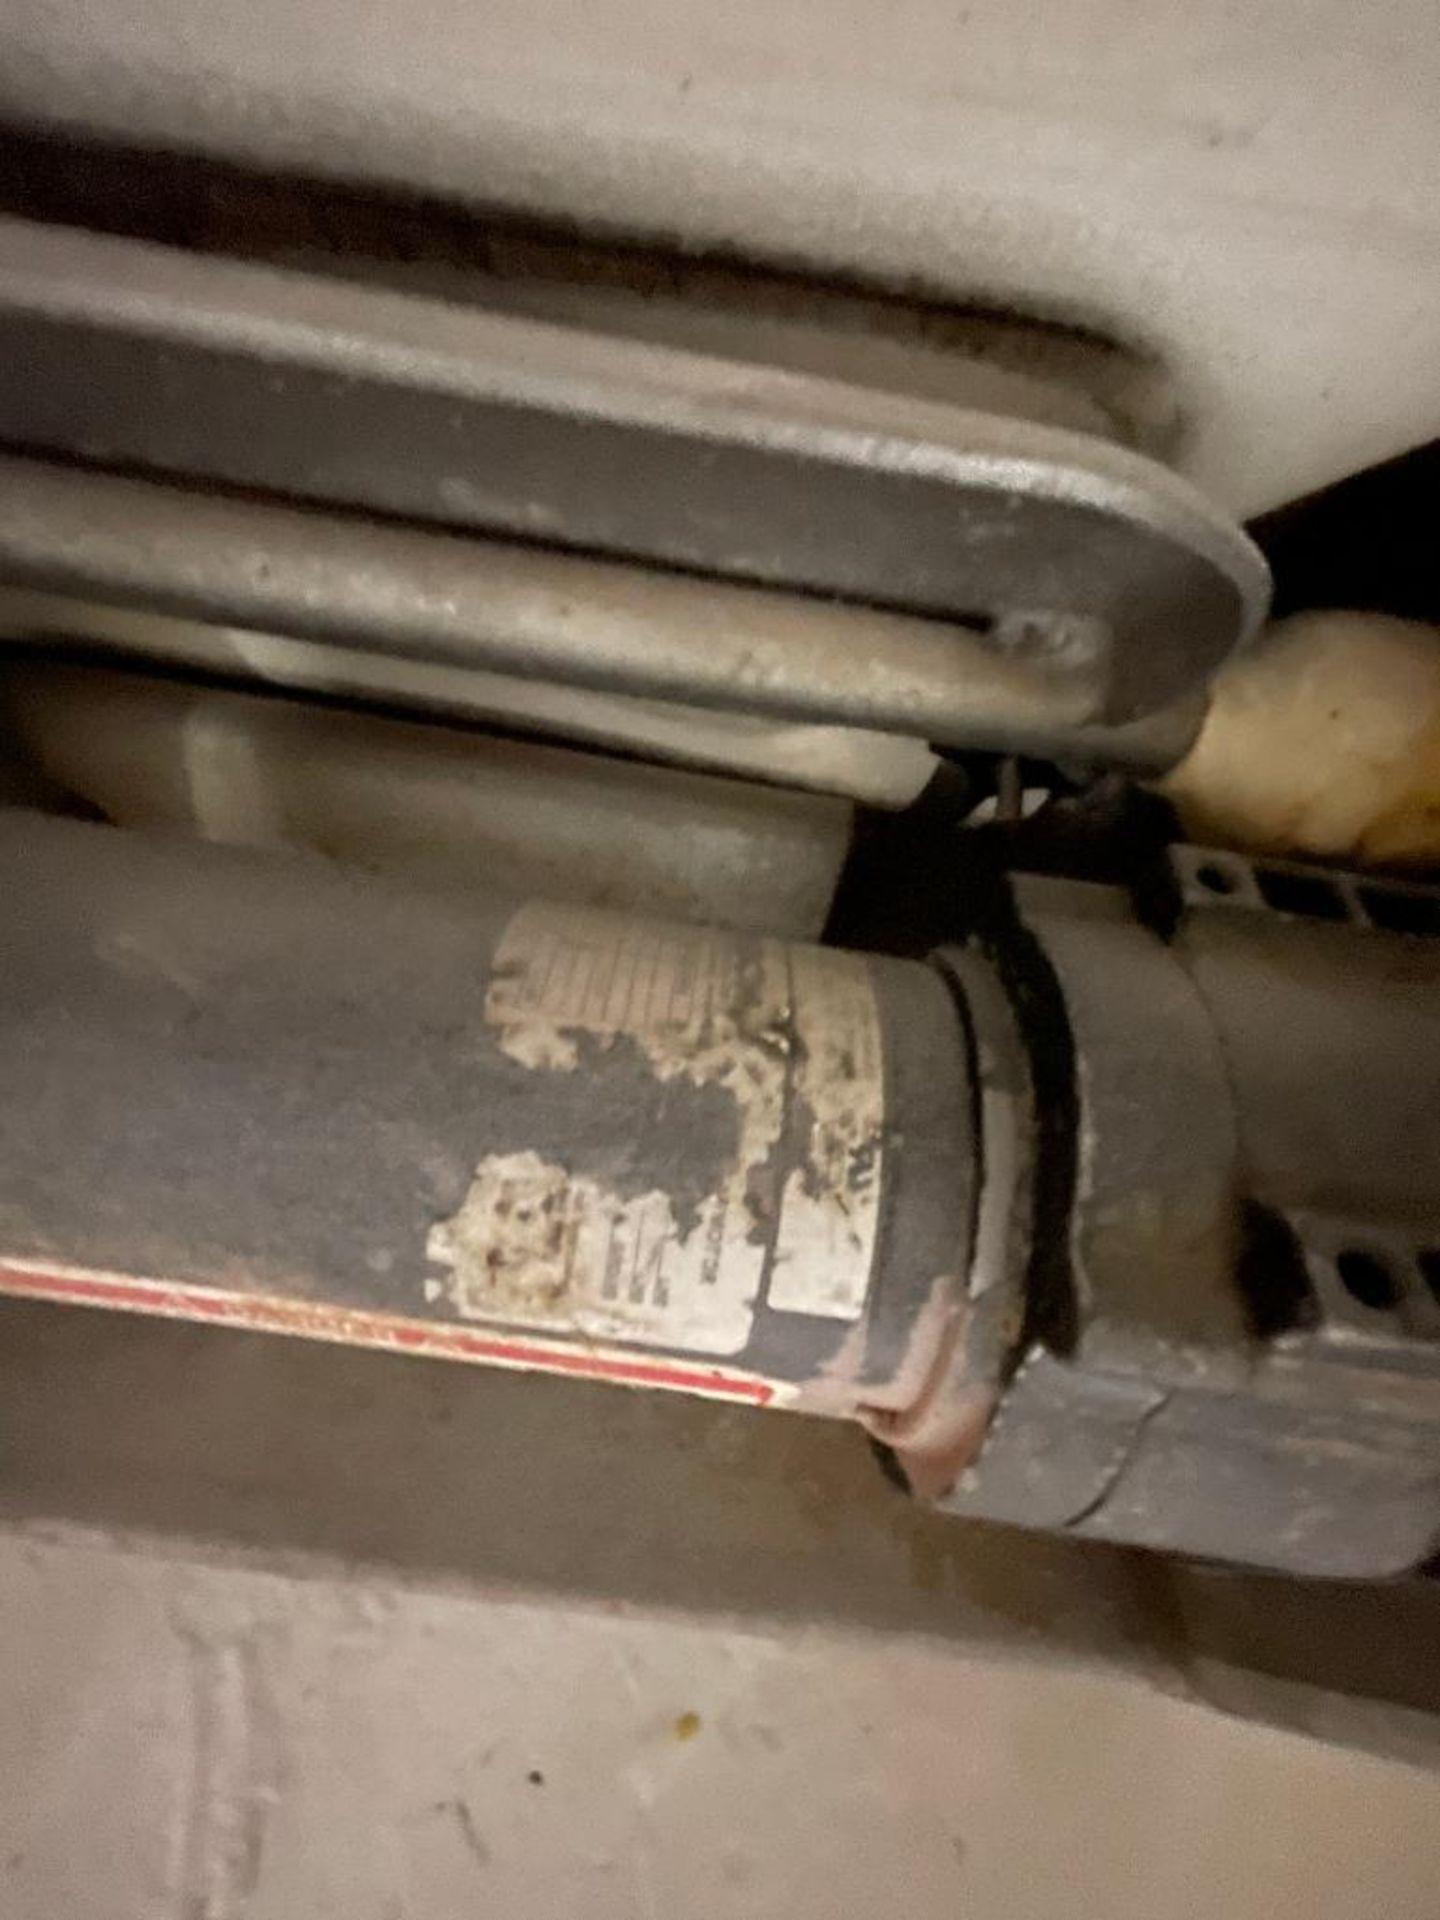 MAC dry ingredients dump station - Image 24 of 24